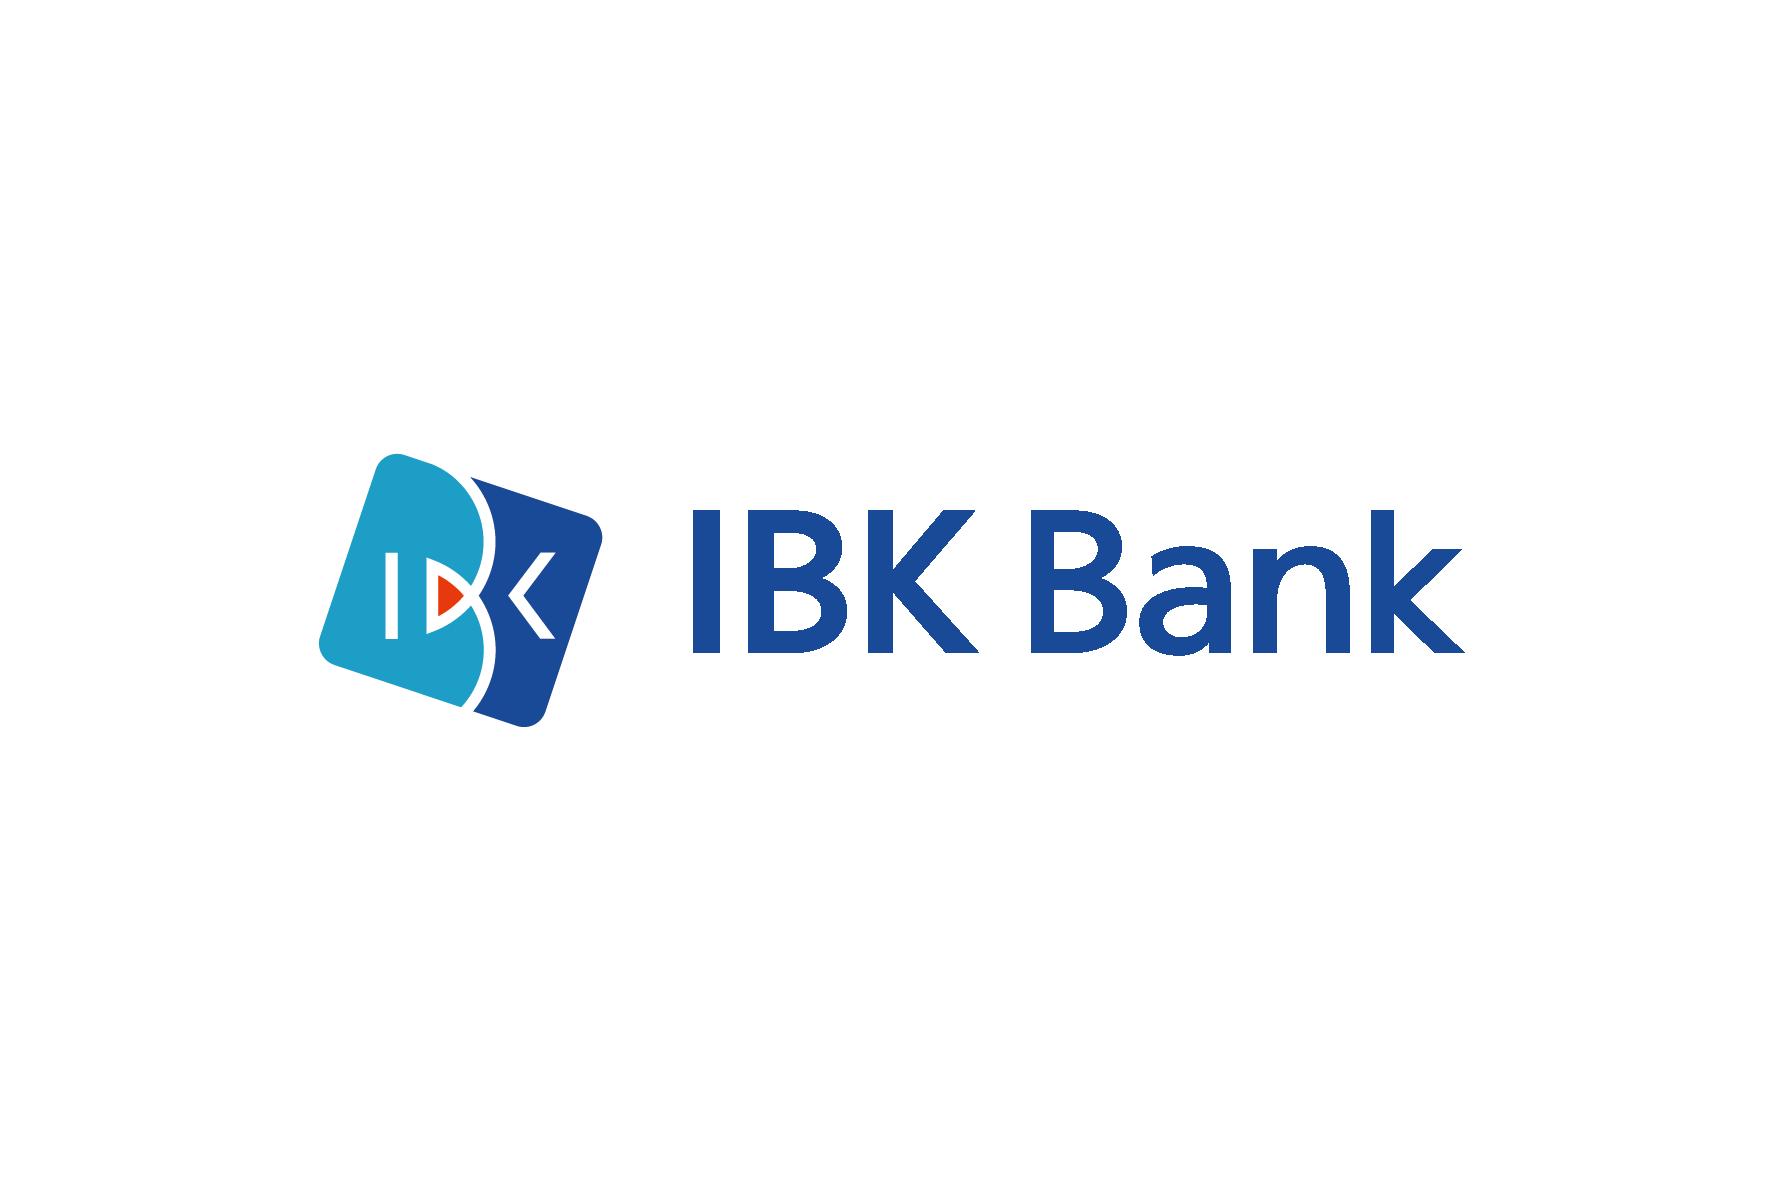 IBK Bank